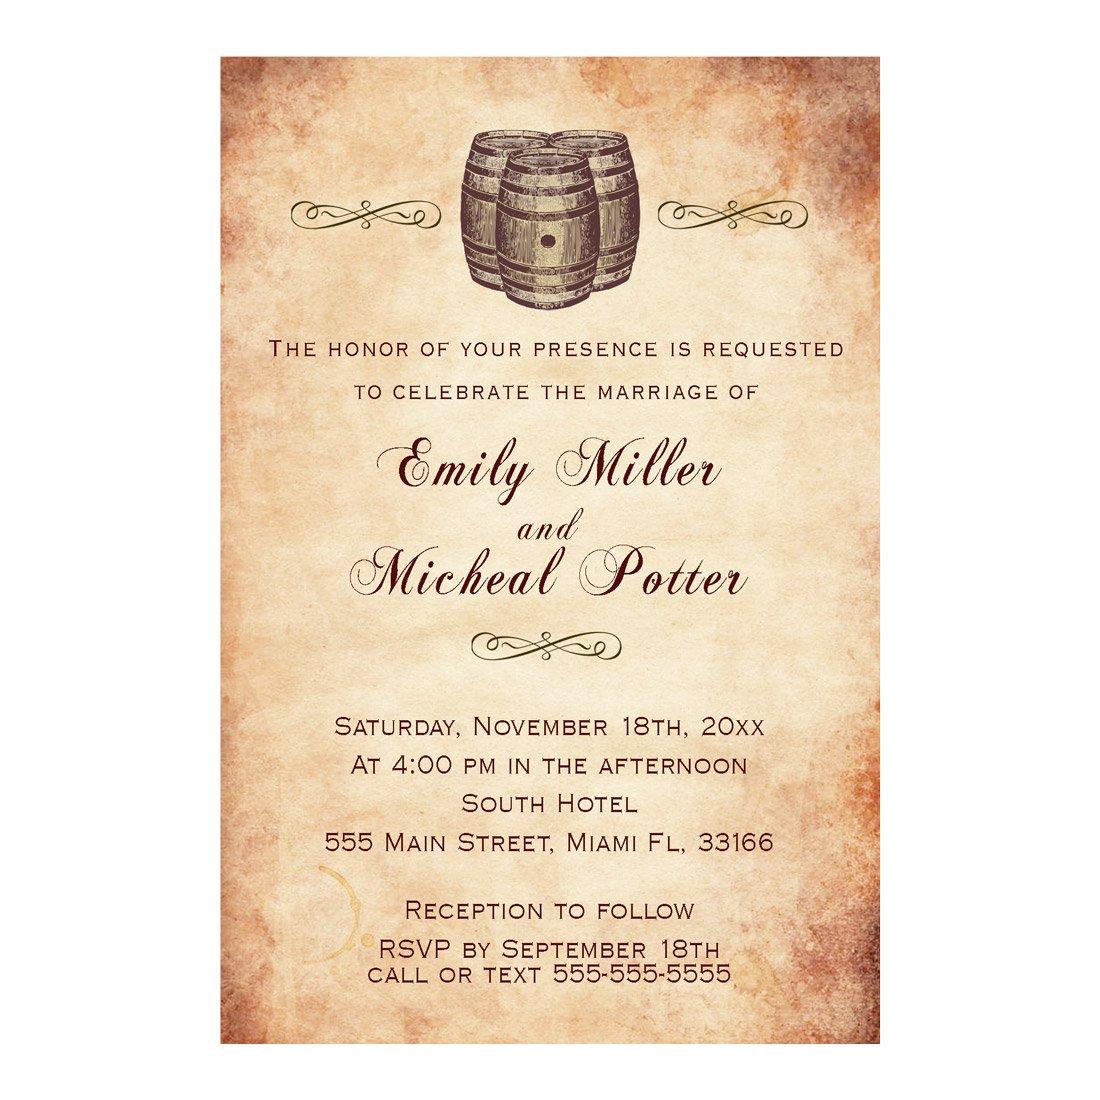 100 Wedding Invitations Wine Barrel Vintage Rustic Paper Design + Envelopes